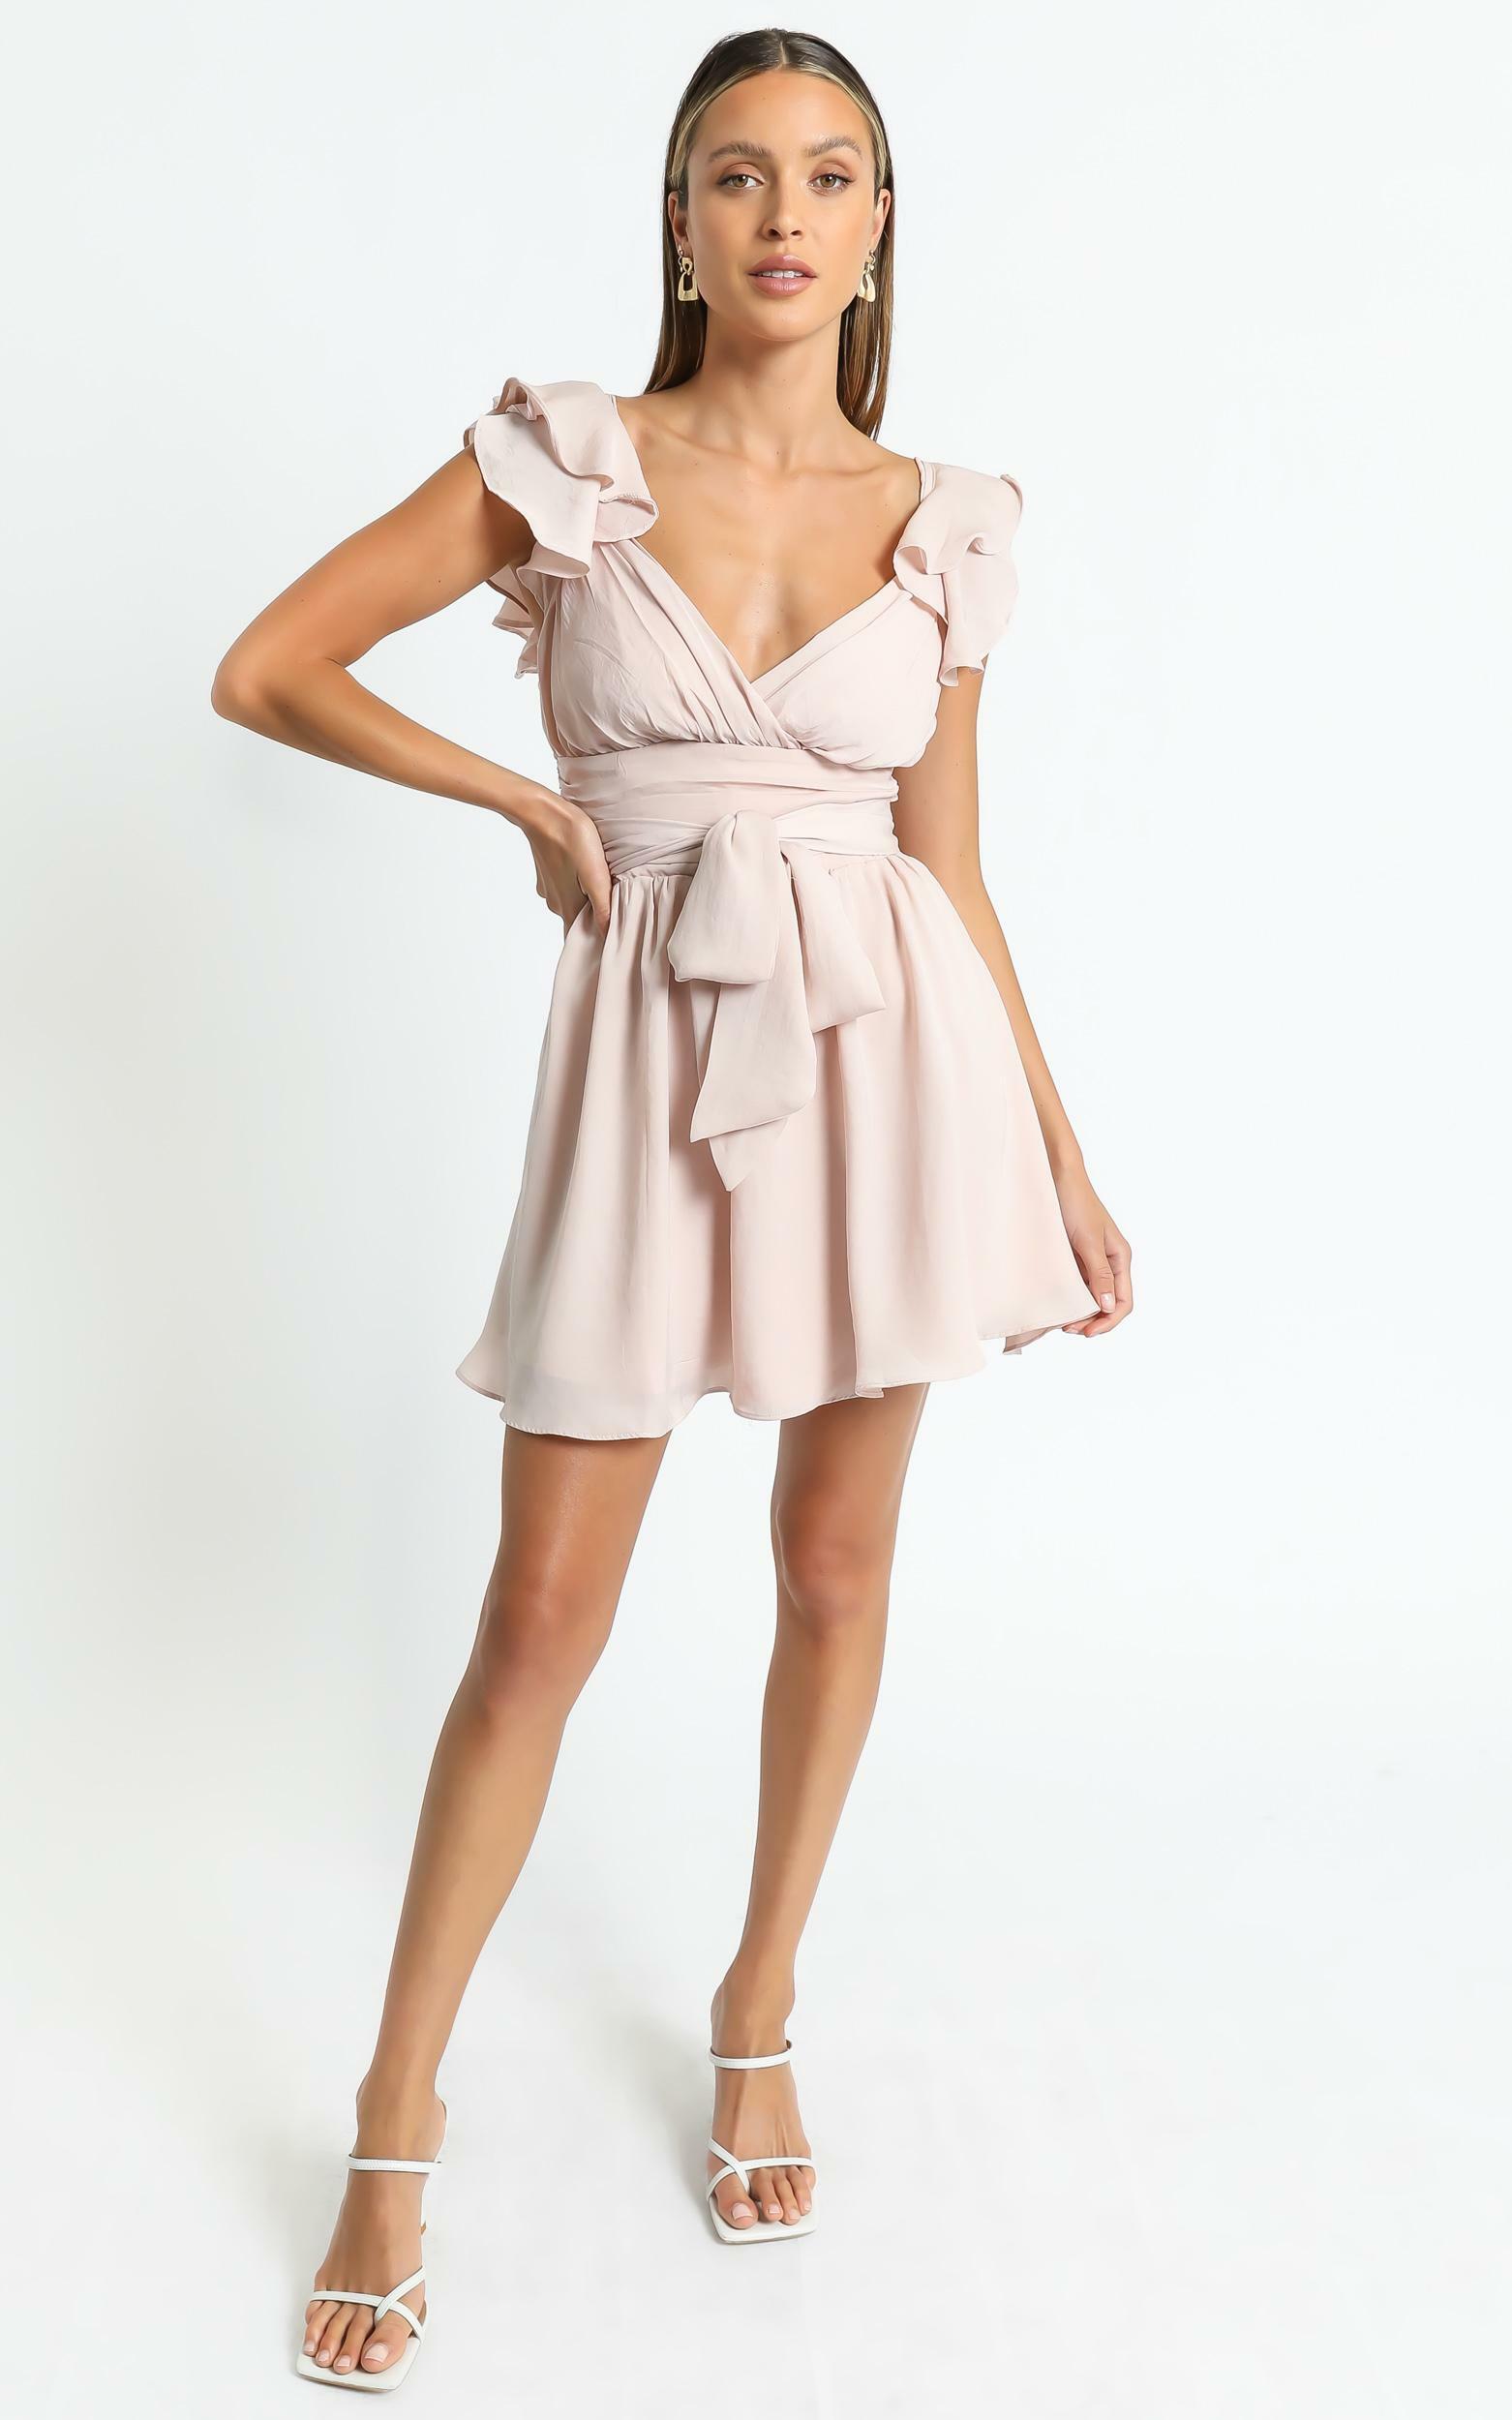 Alene Dress in Nude - 06, BRN1, hi-res image number null